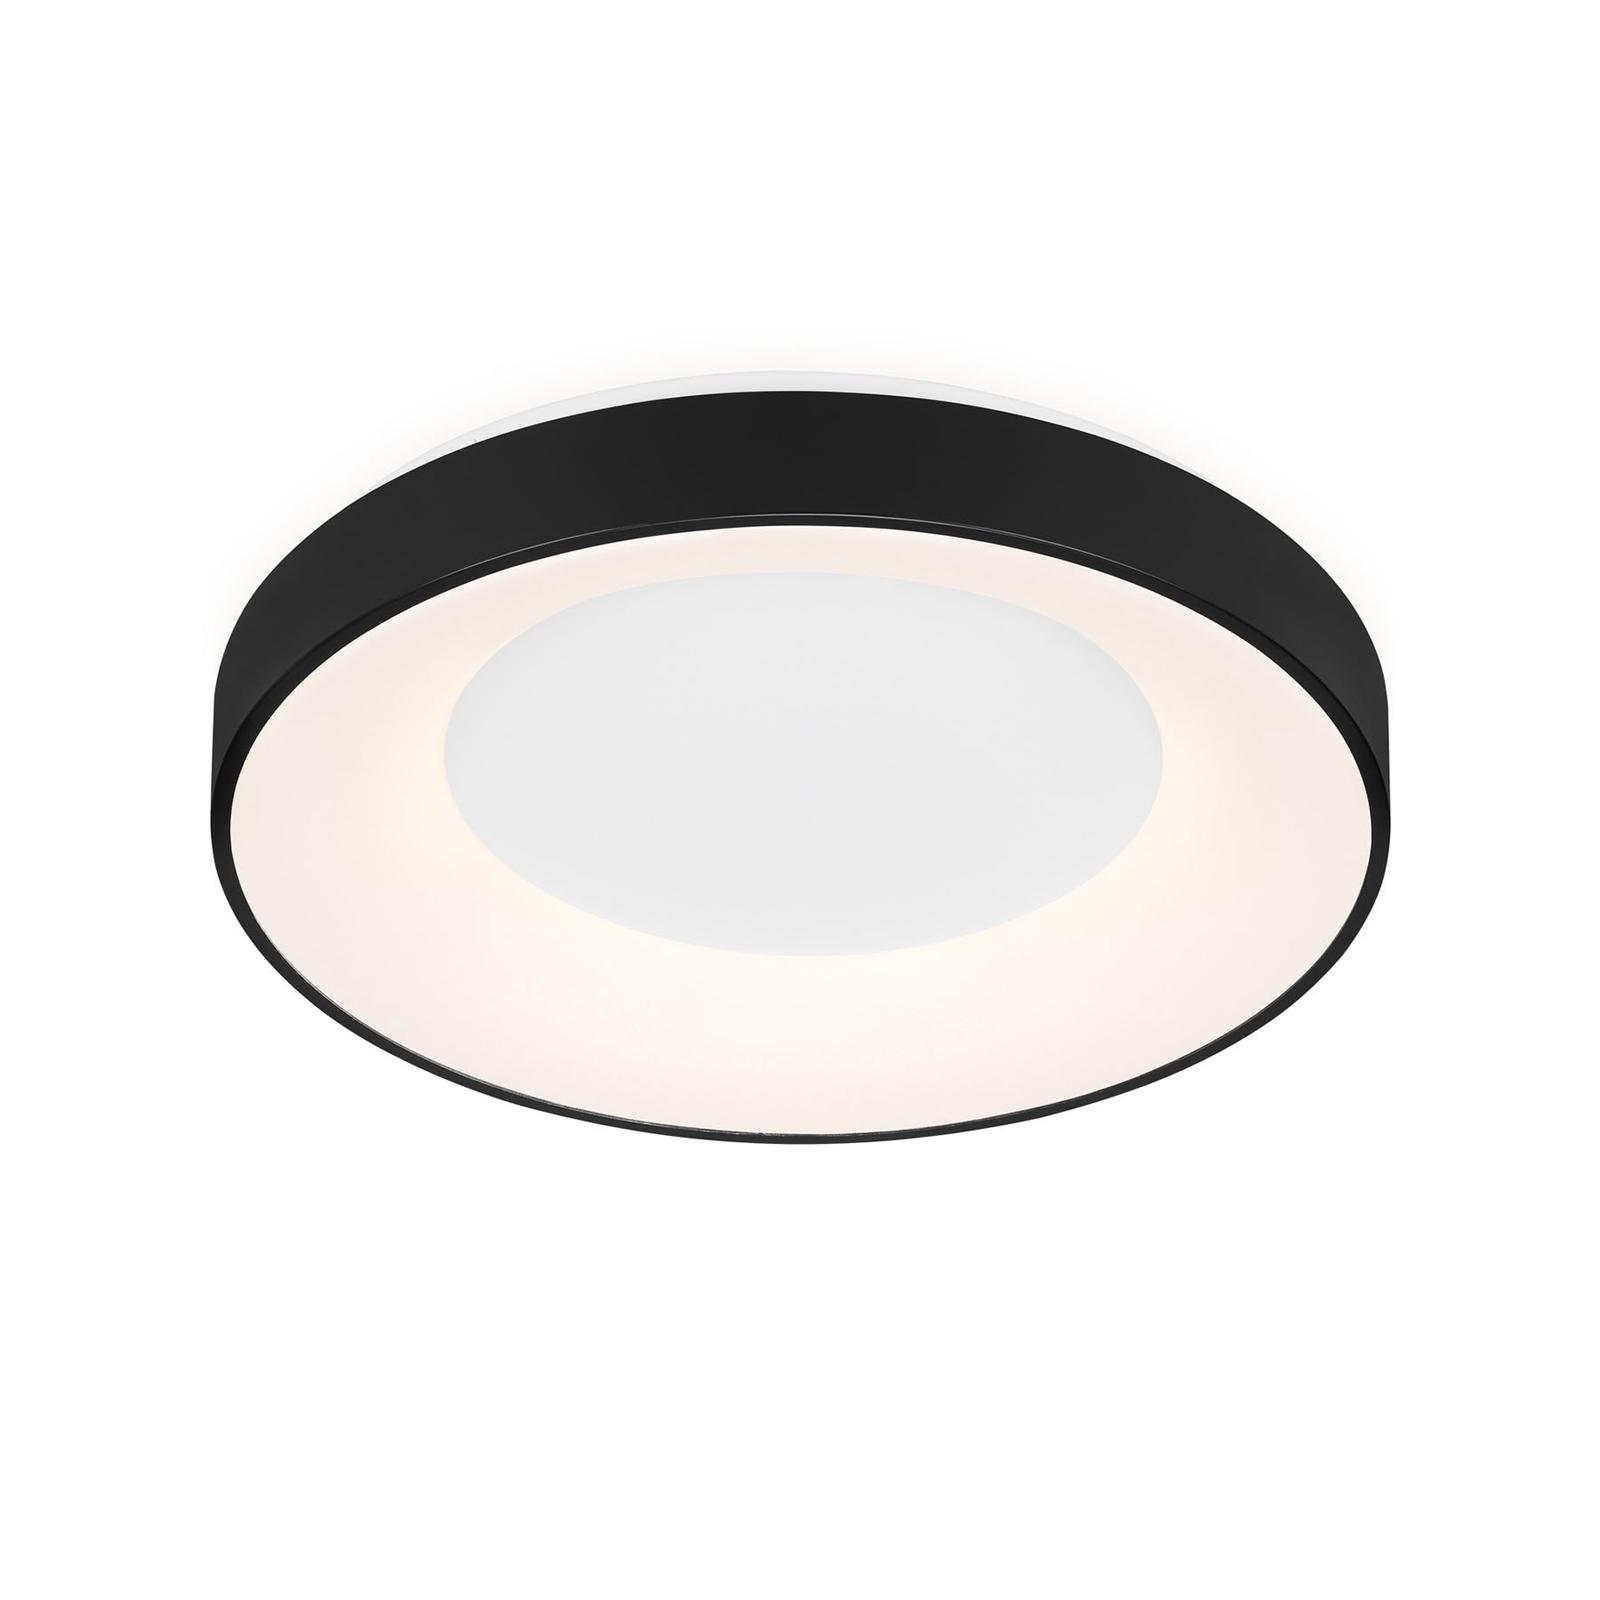 LED-taklampe Rondo CCT-fjernkontroll, svart